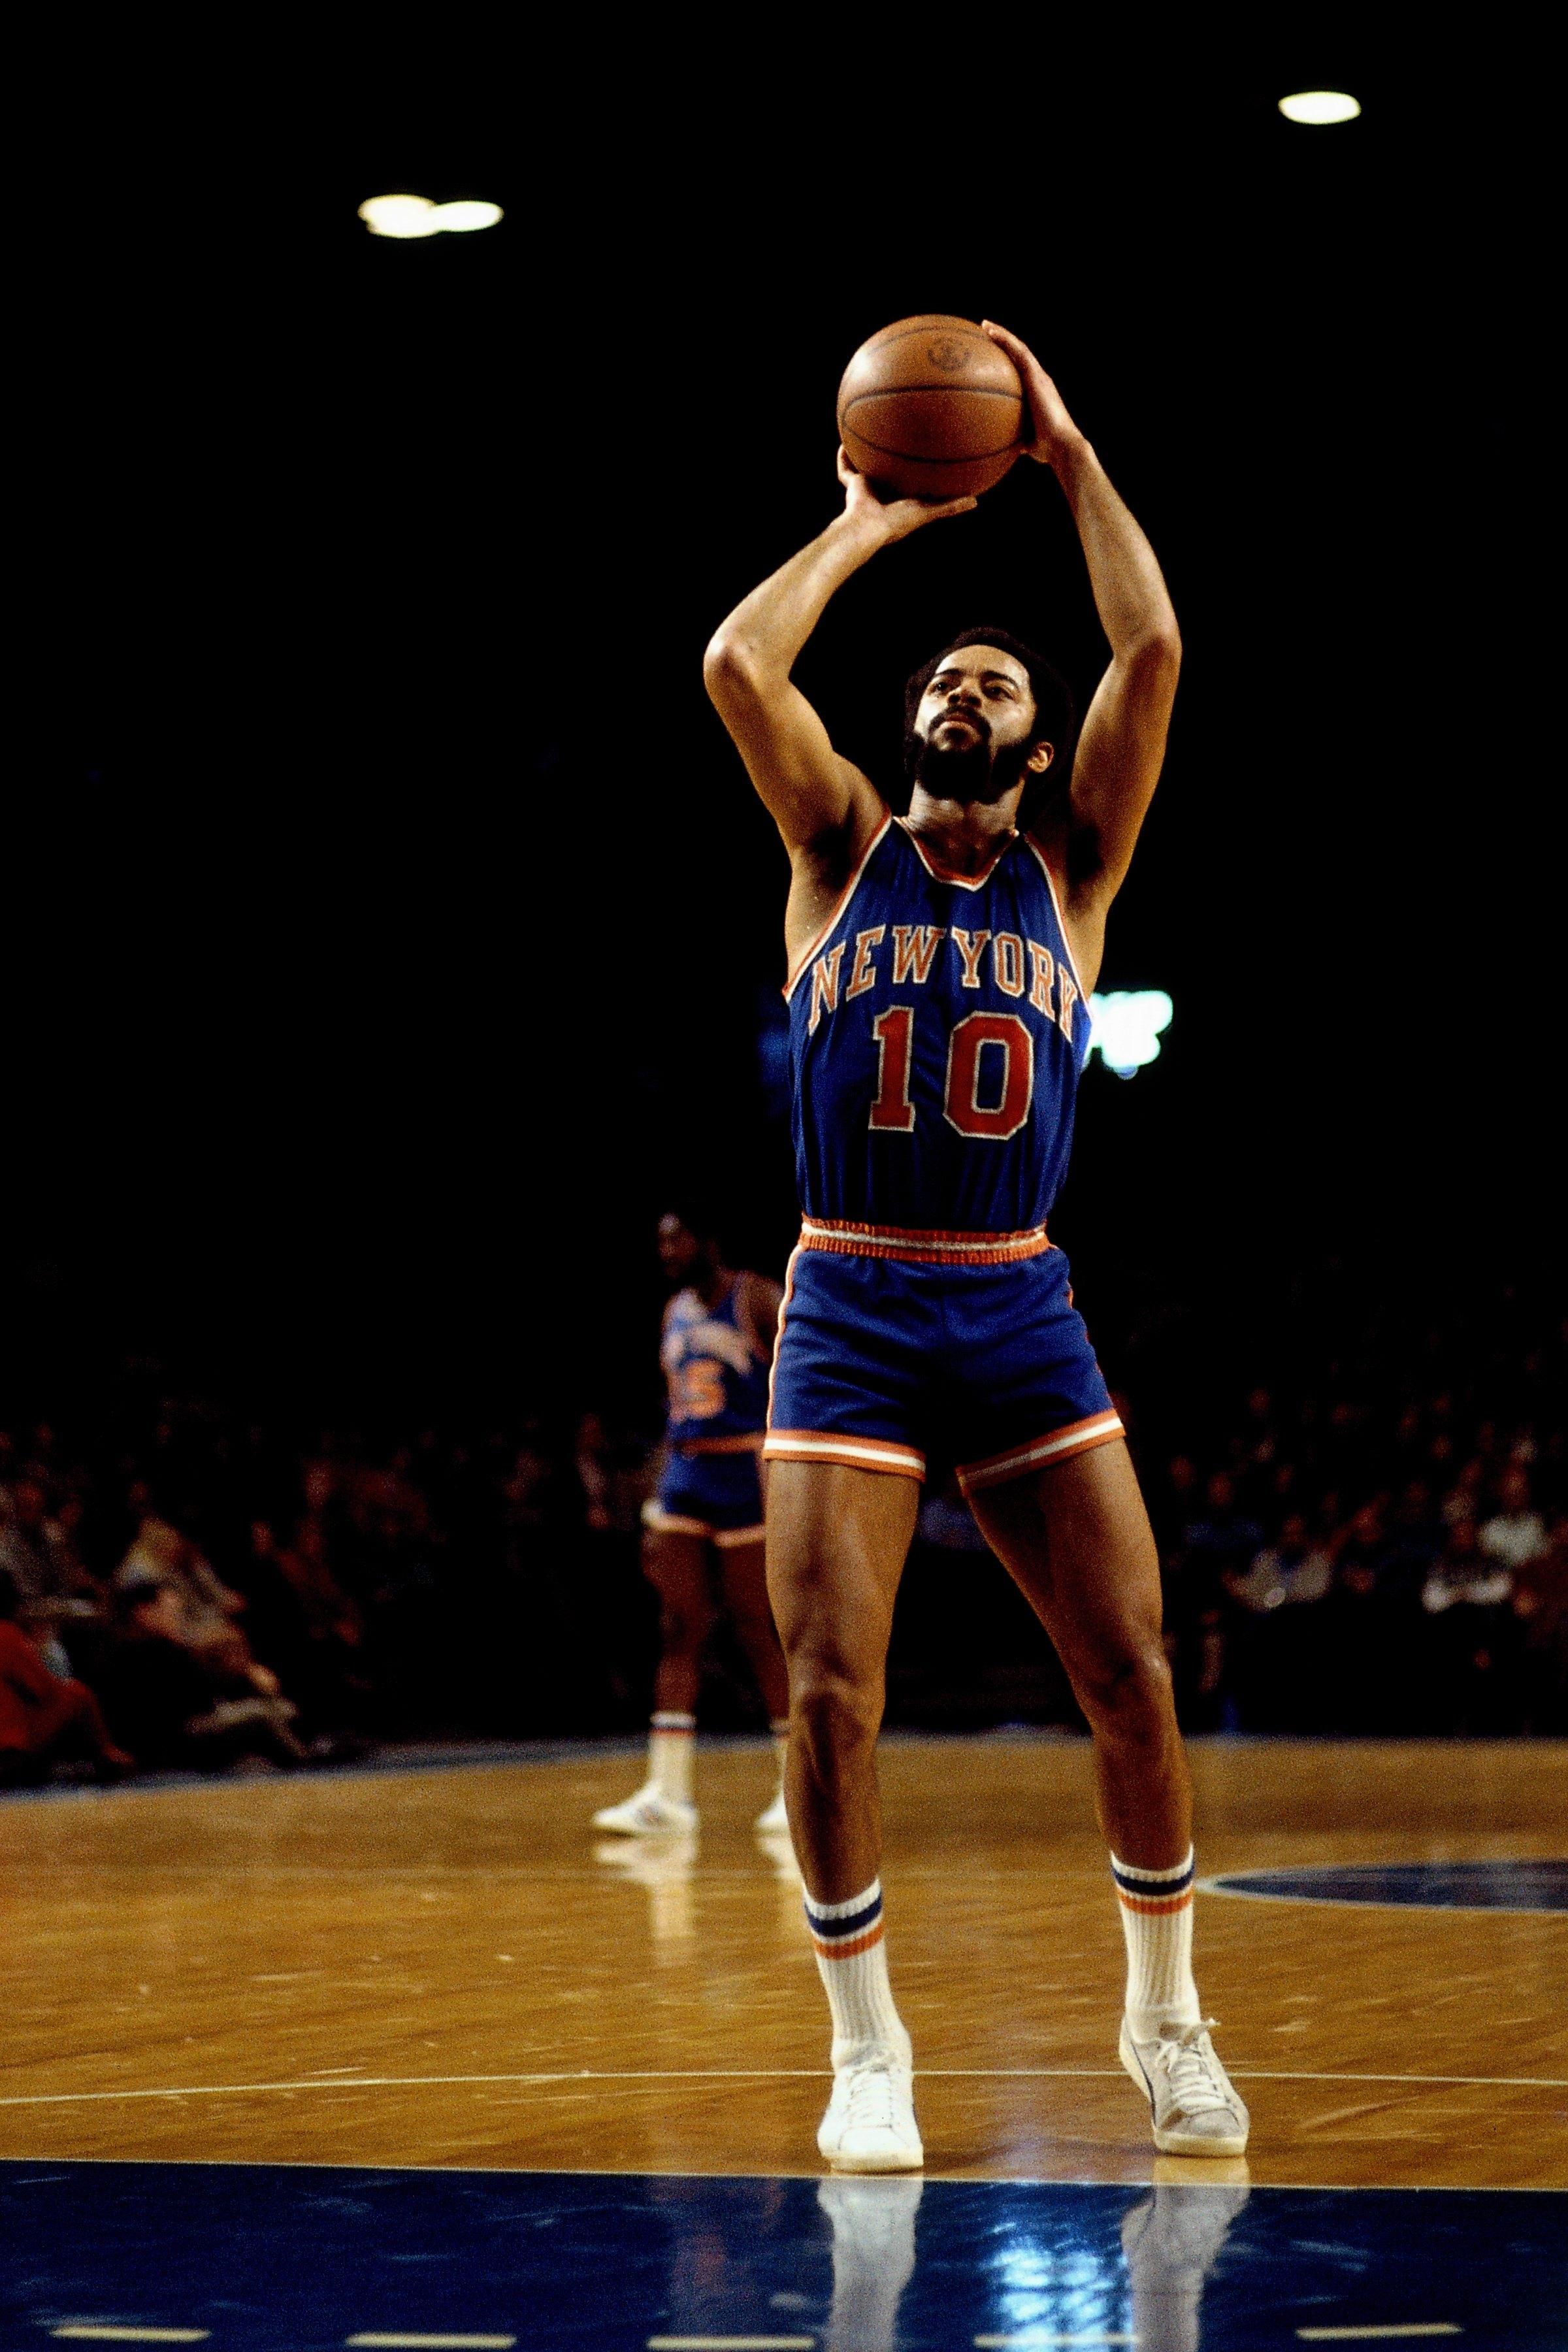 Jordan Kobe LeBron How the NBA Influenced Popular Culture